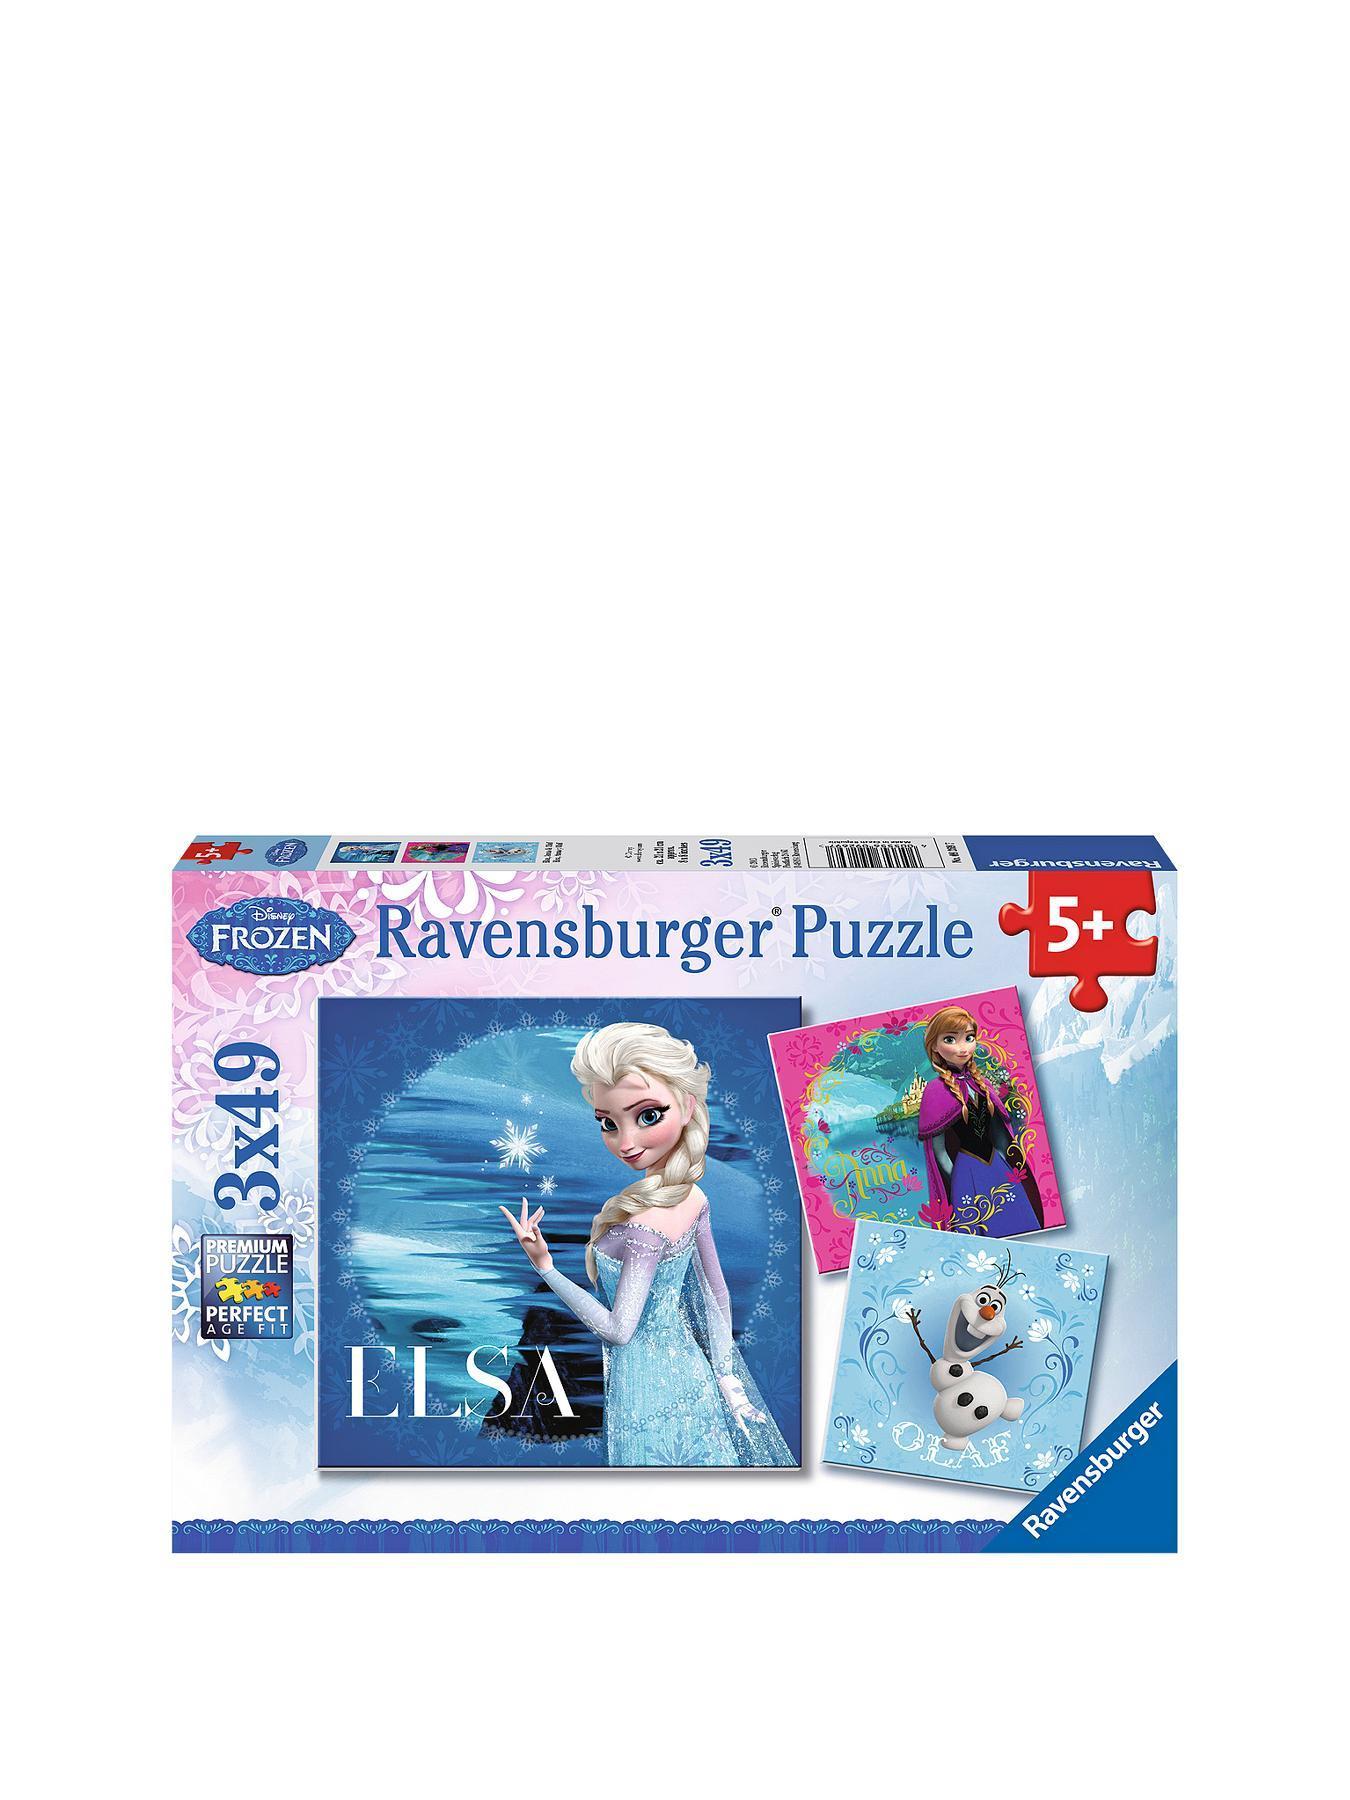 Ravensburger Disney Frozen 3 x 49-Piece Jigsaw Puzzles